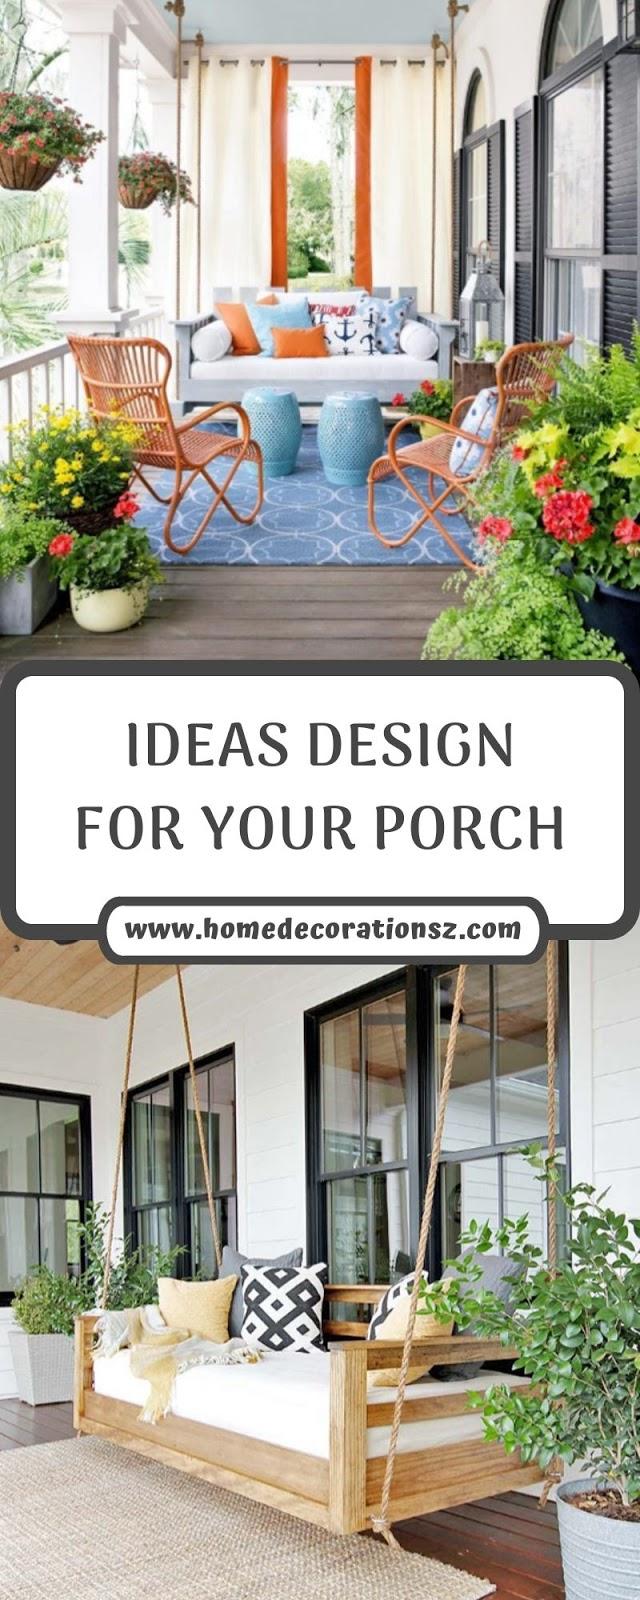 IDEAS DESIGN FOR YOUR PORCH